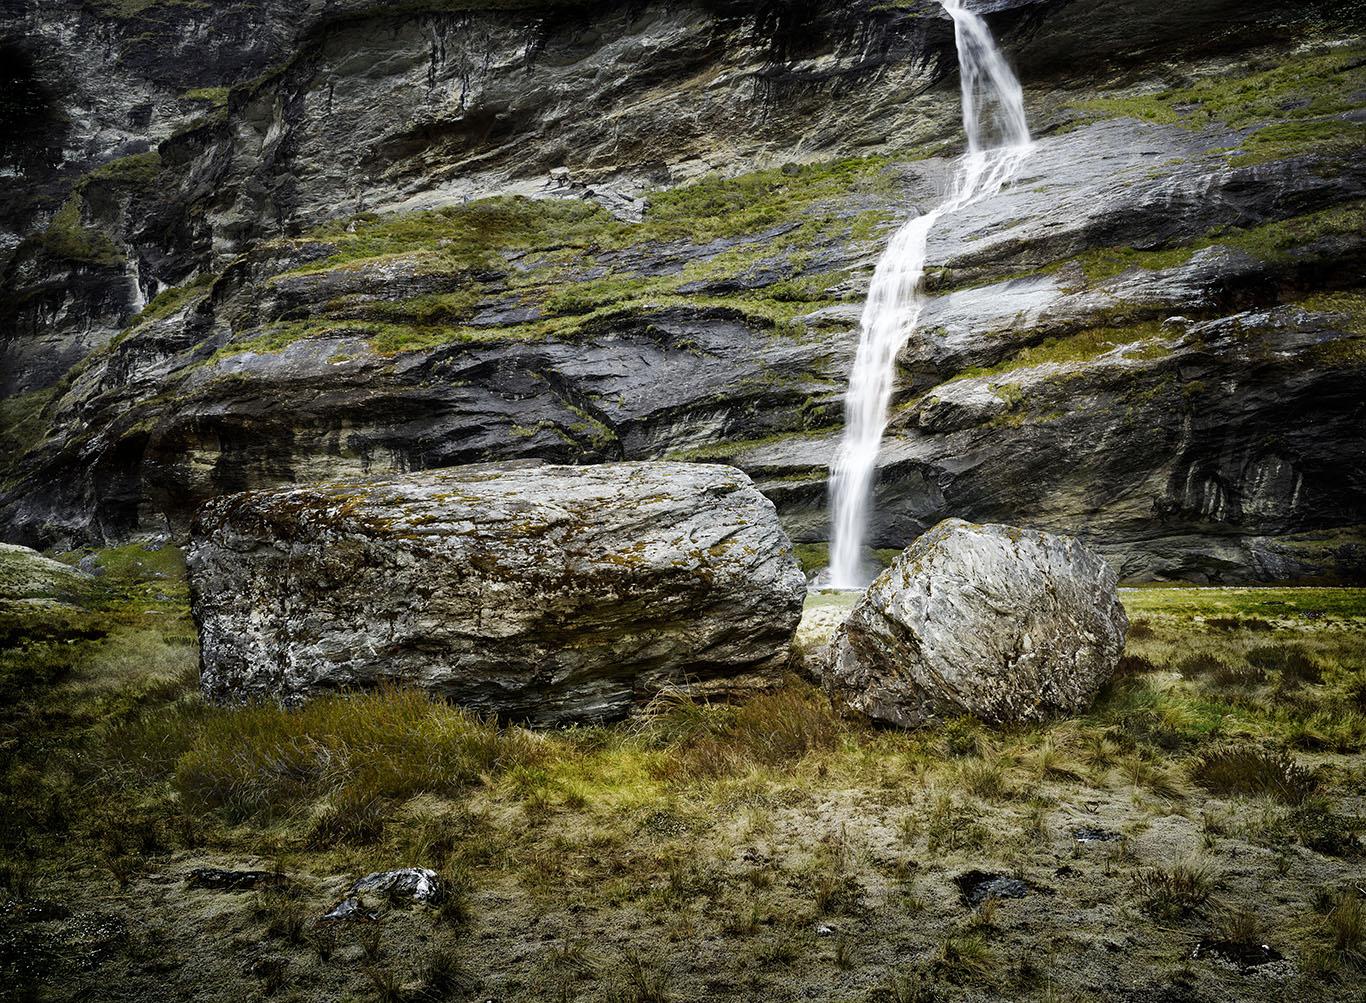 Ernstlaw Burn_Waterfall_Rocks.jpg